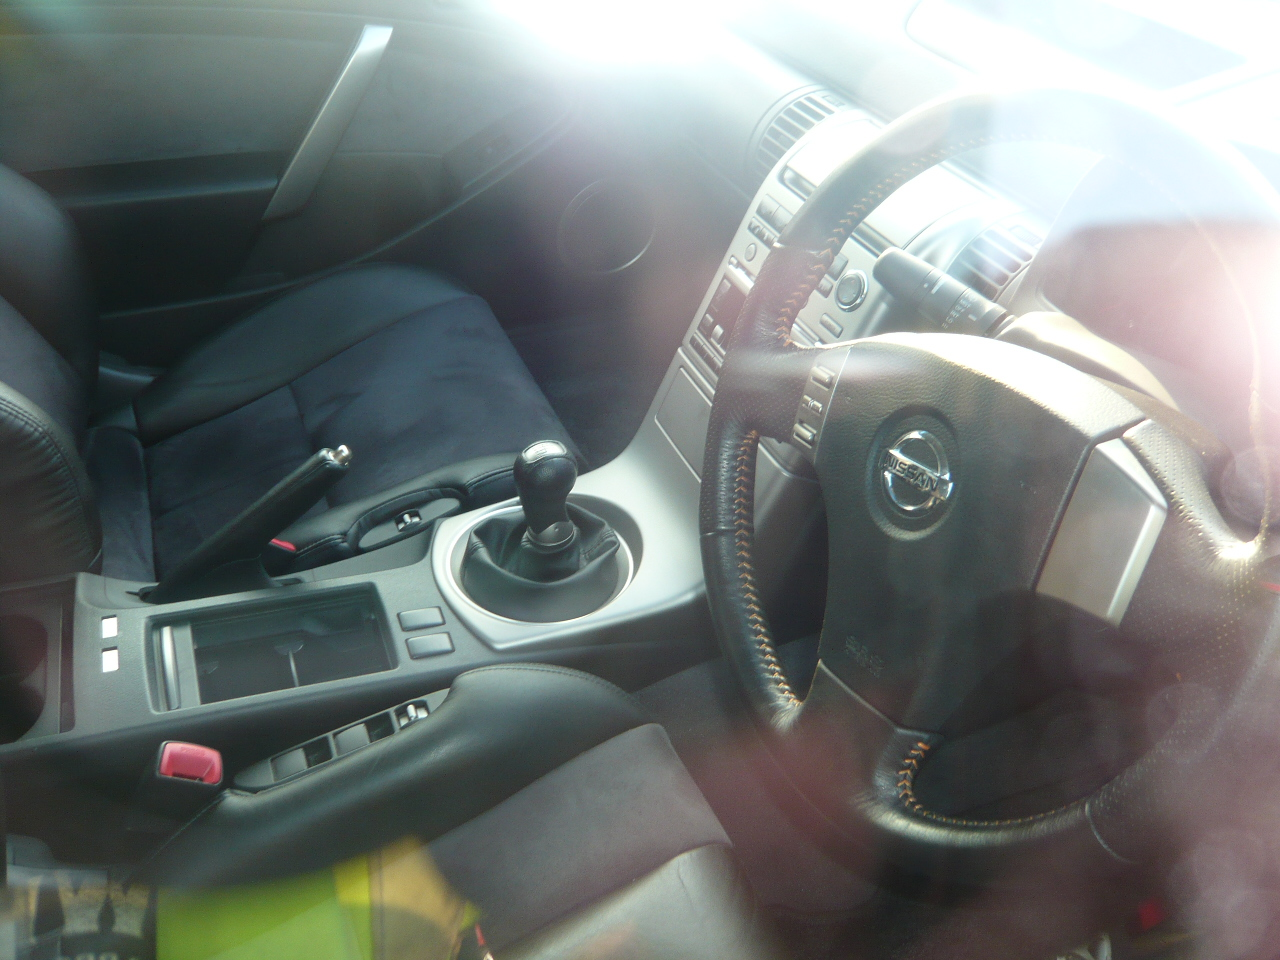 2004 Nissan Skyline V35 350GT Premium coupe 6 speed manual interior